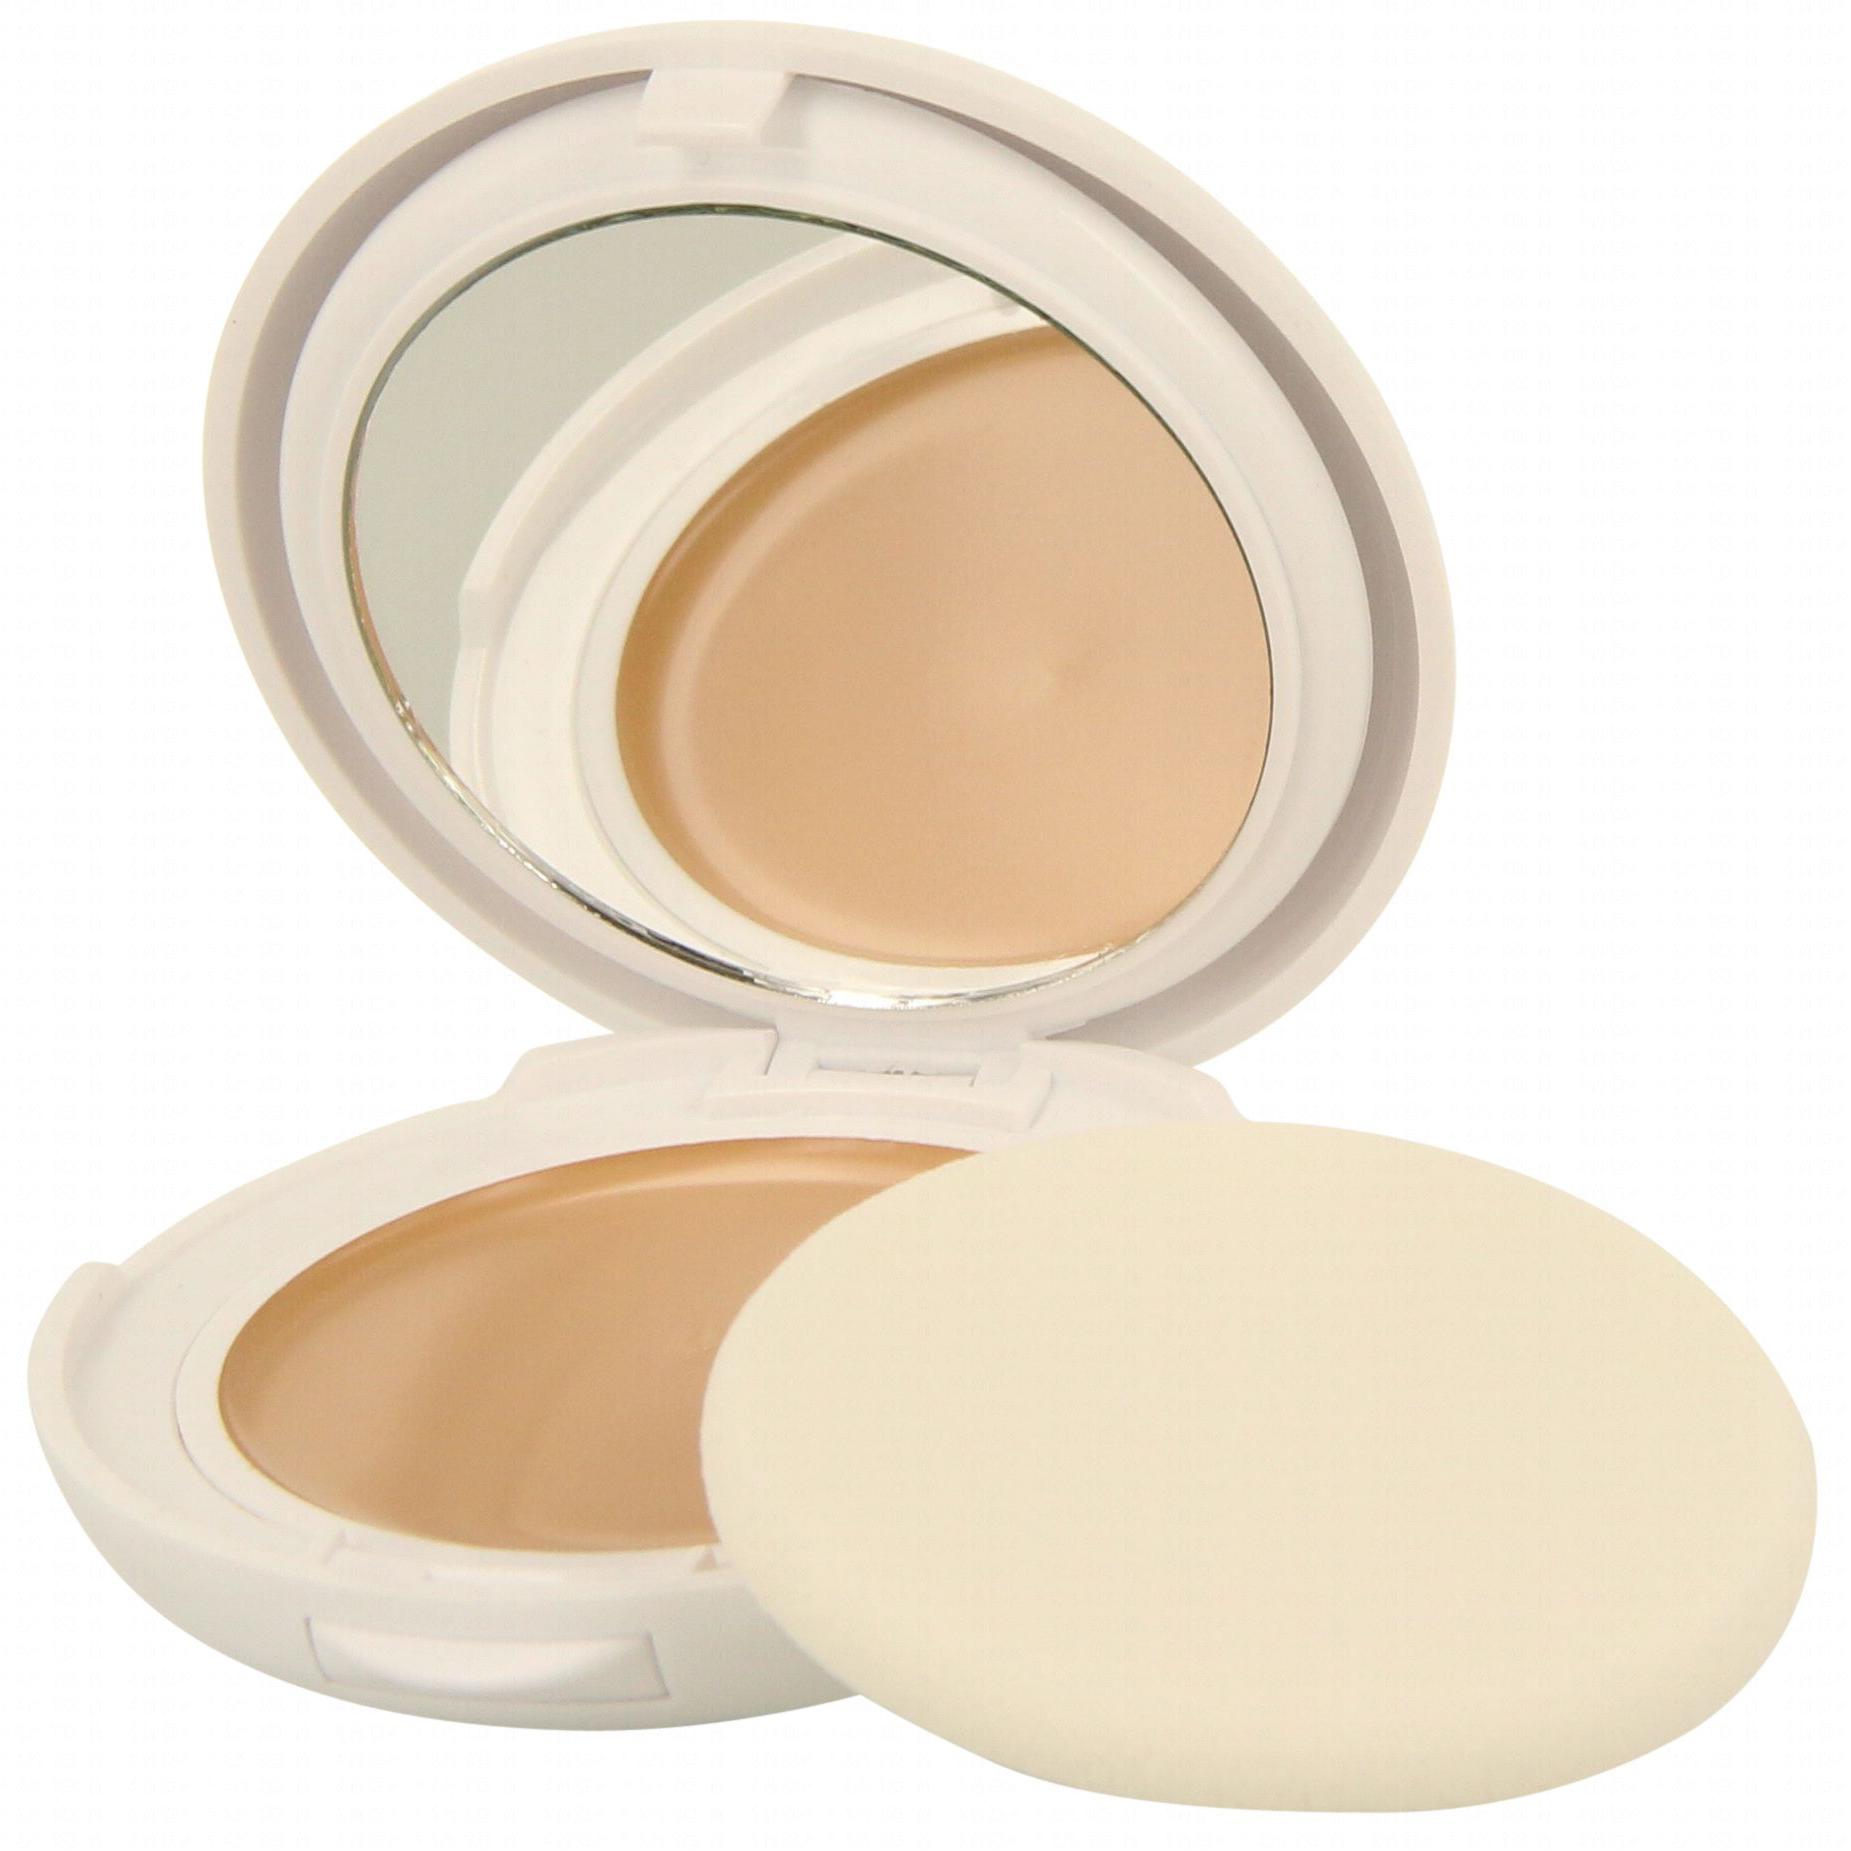 Avene Couvrance Compact Confort Make-up σε Μορφή Στερεάς Κρέμας Compact 9,5gr – Porcelaine (01)